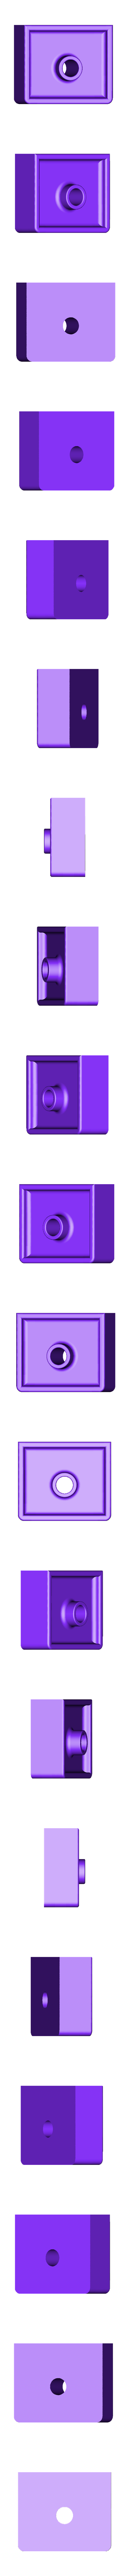 CR_10_ZShaft_Housing_V2.stl Download free STL file Creality CR-10 Z Shaft Housing V.2 • 3D printing design, Double_Alfa_3D